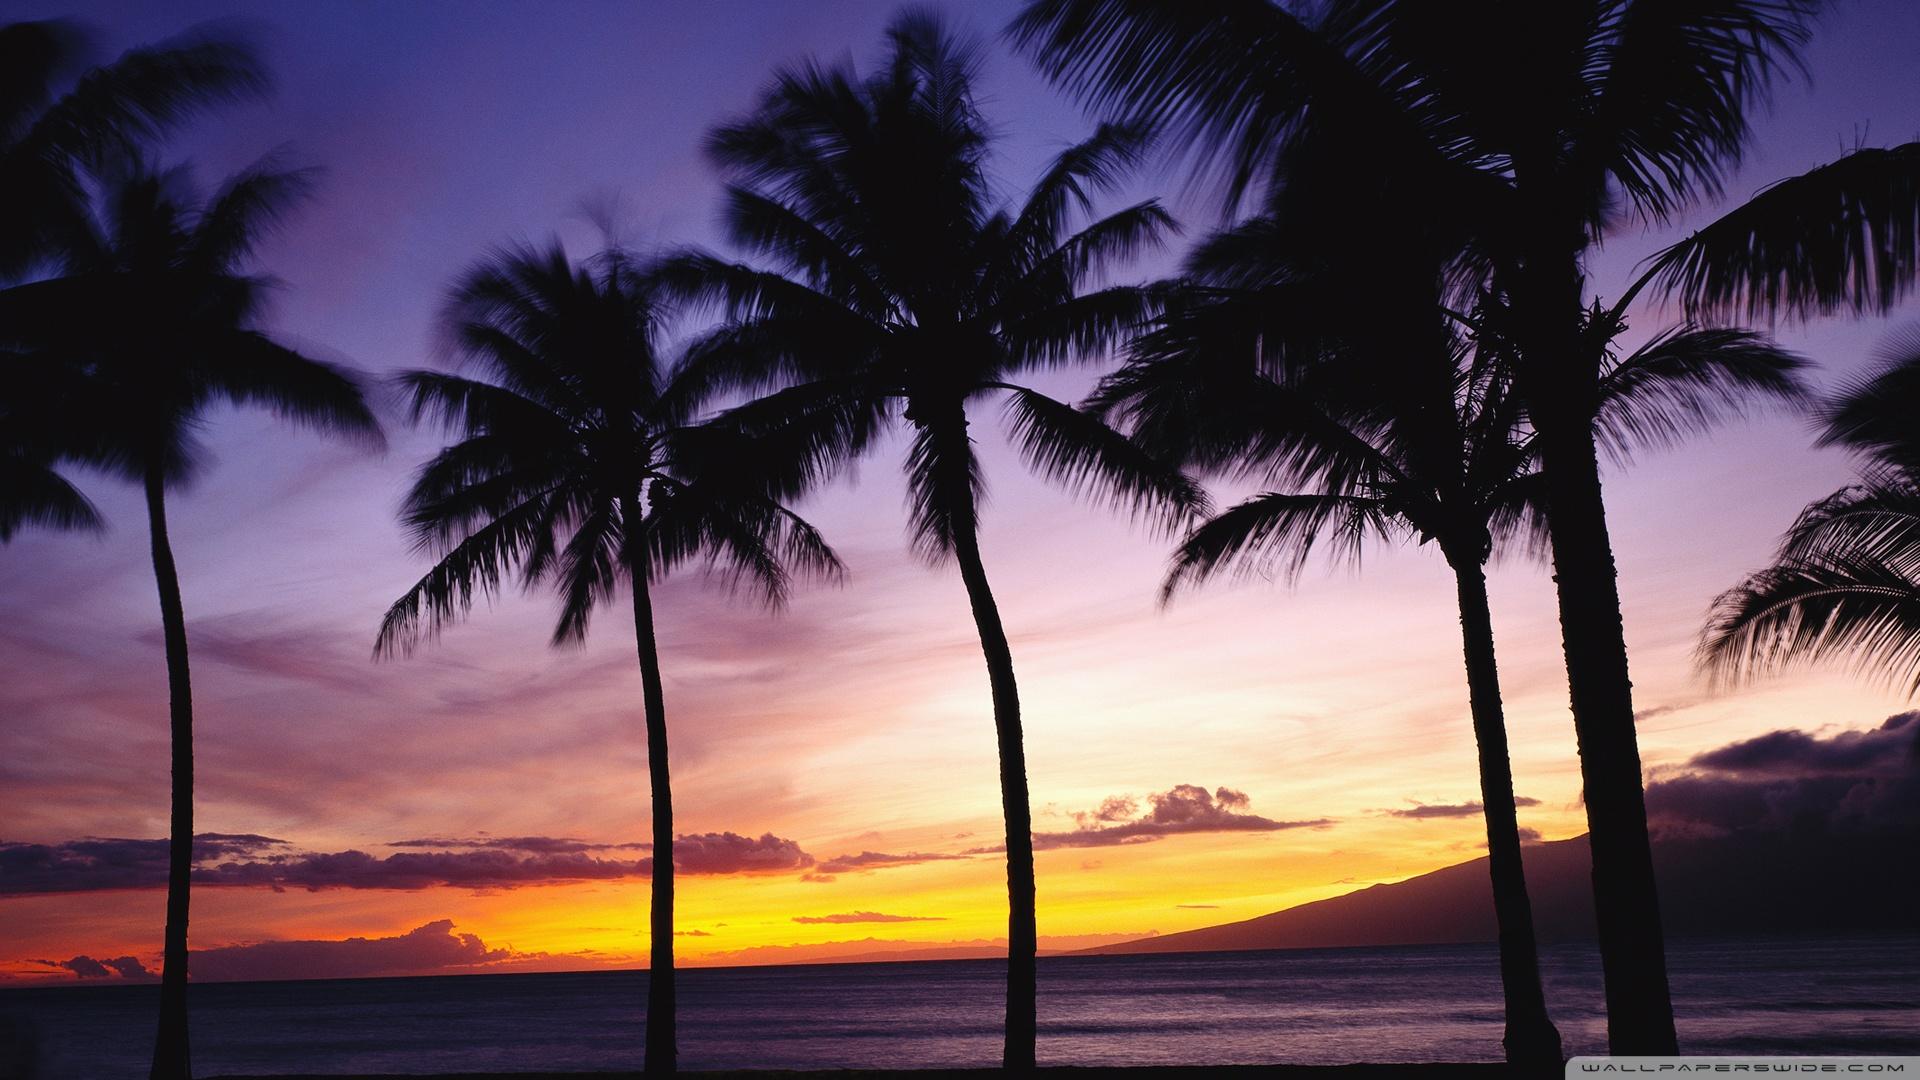 palm trees sunset 00433779 1920x1080